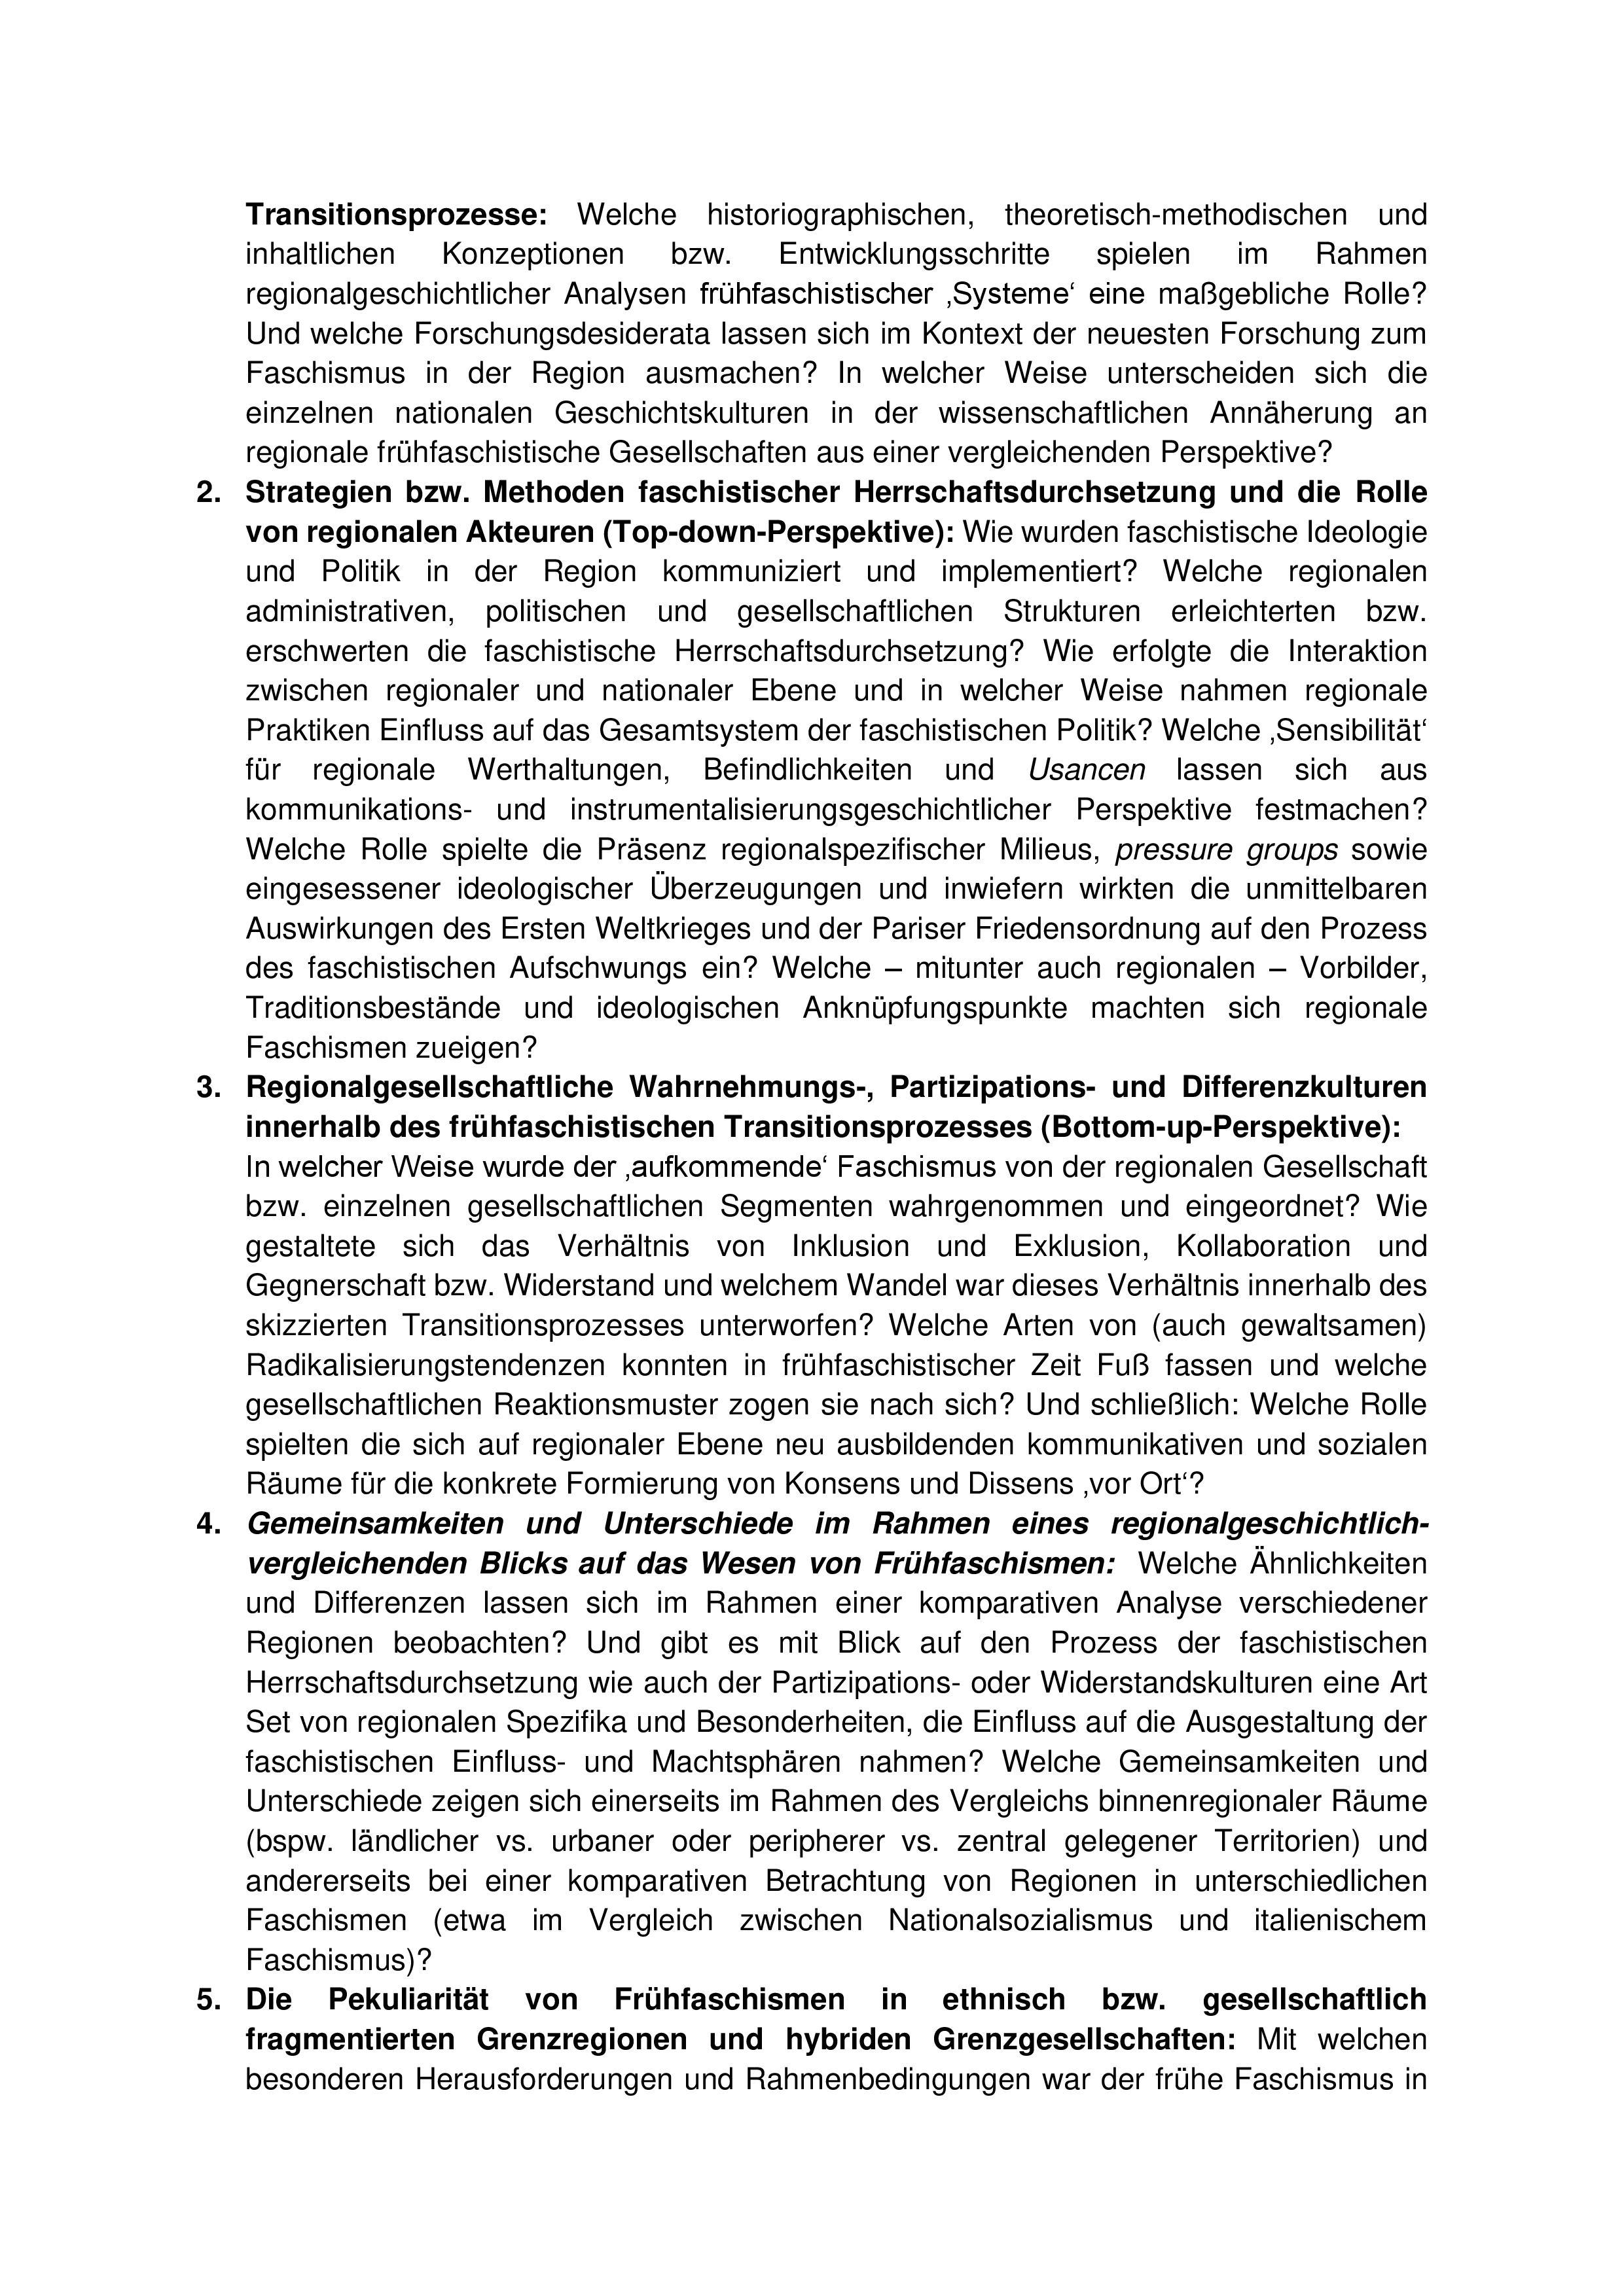 CfP_Fruehfaschismen (1)-page-002